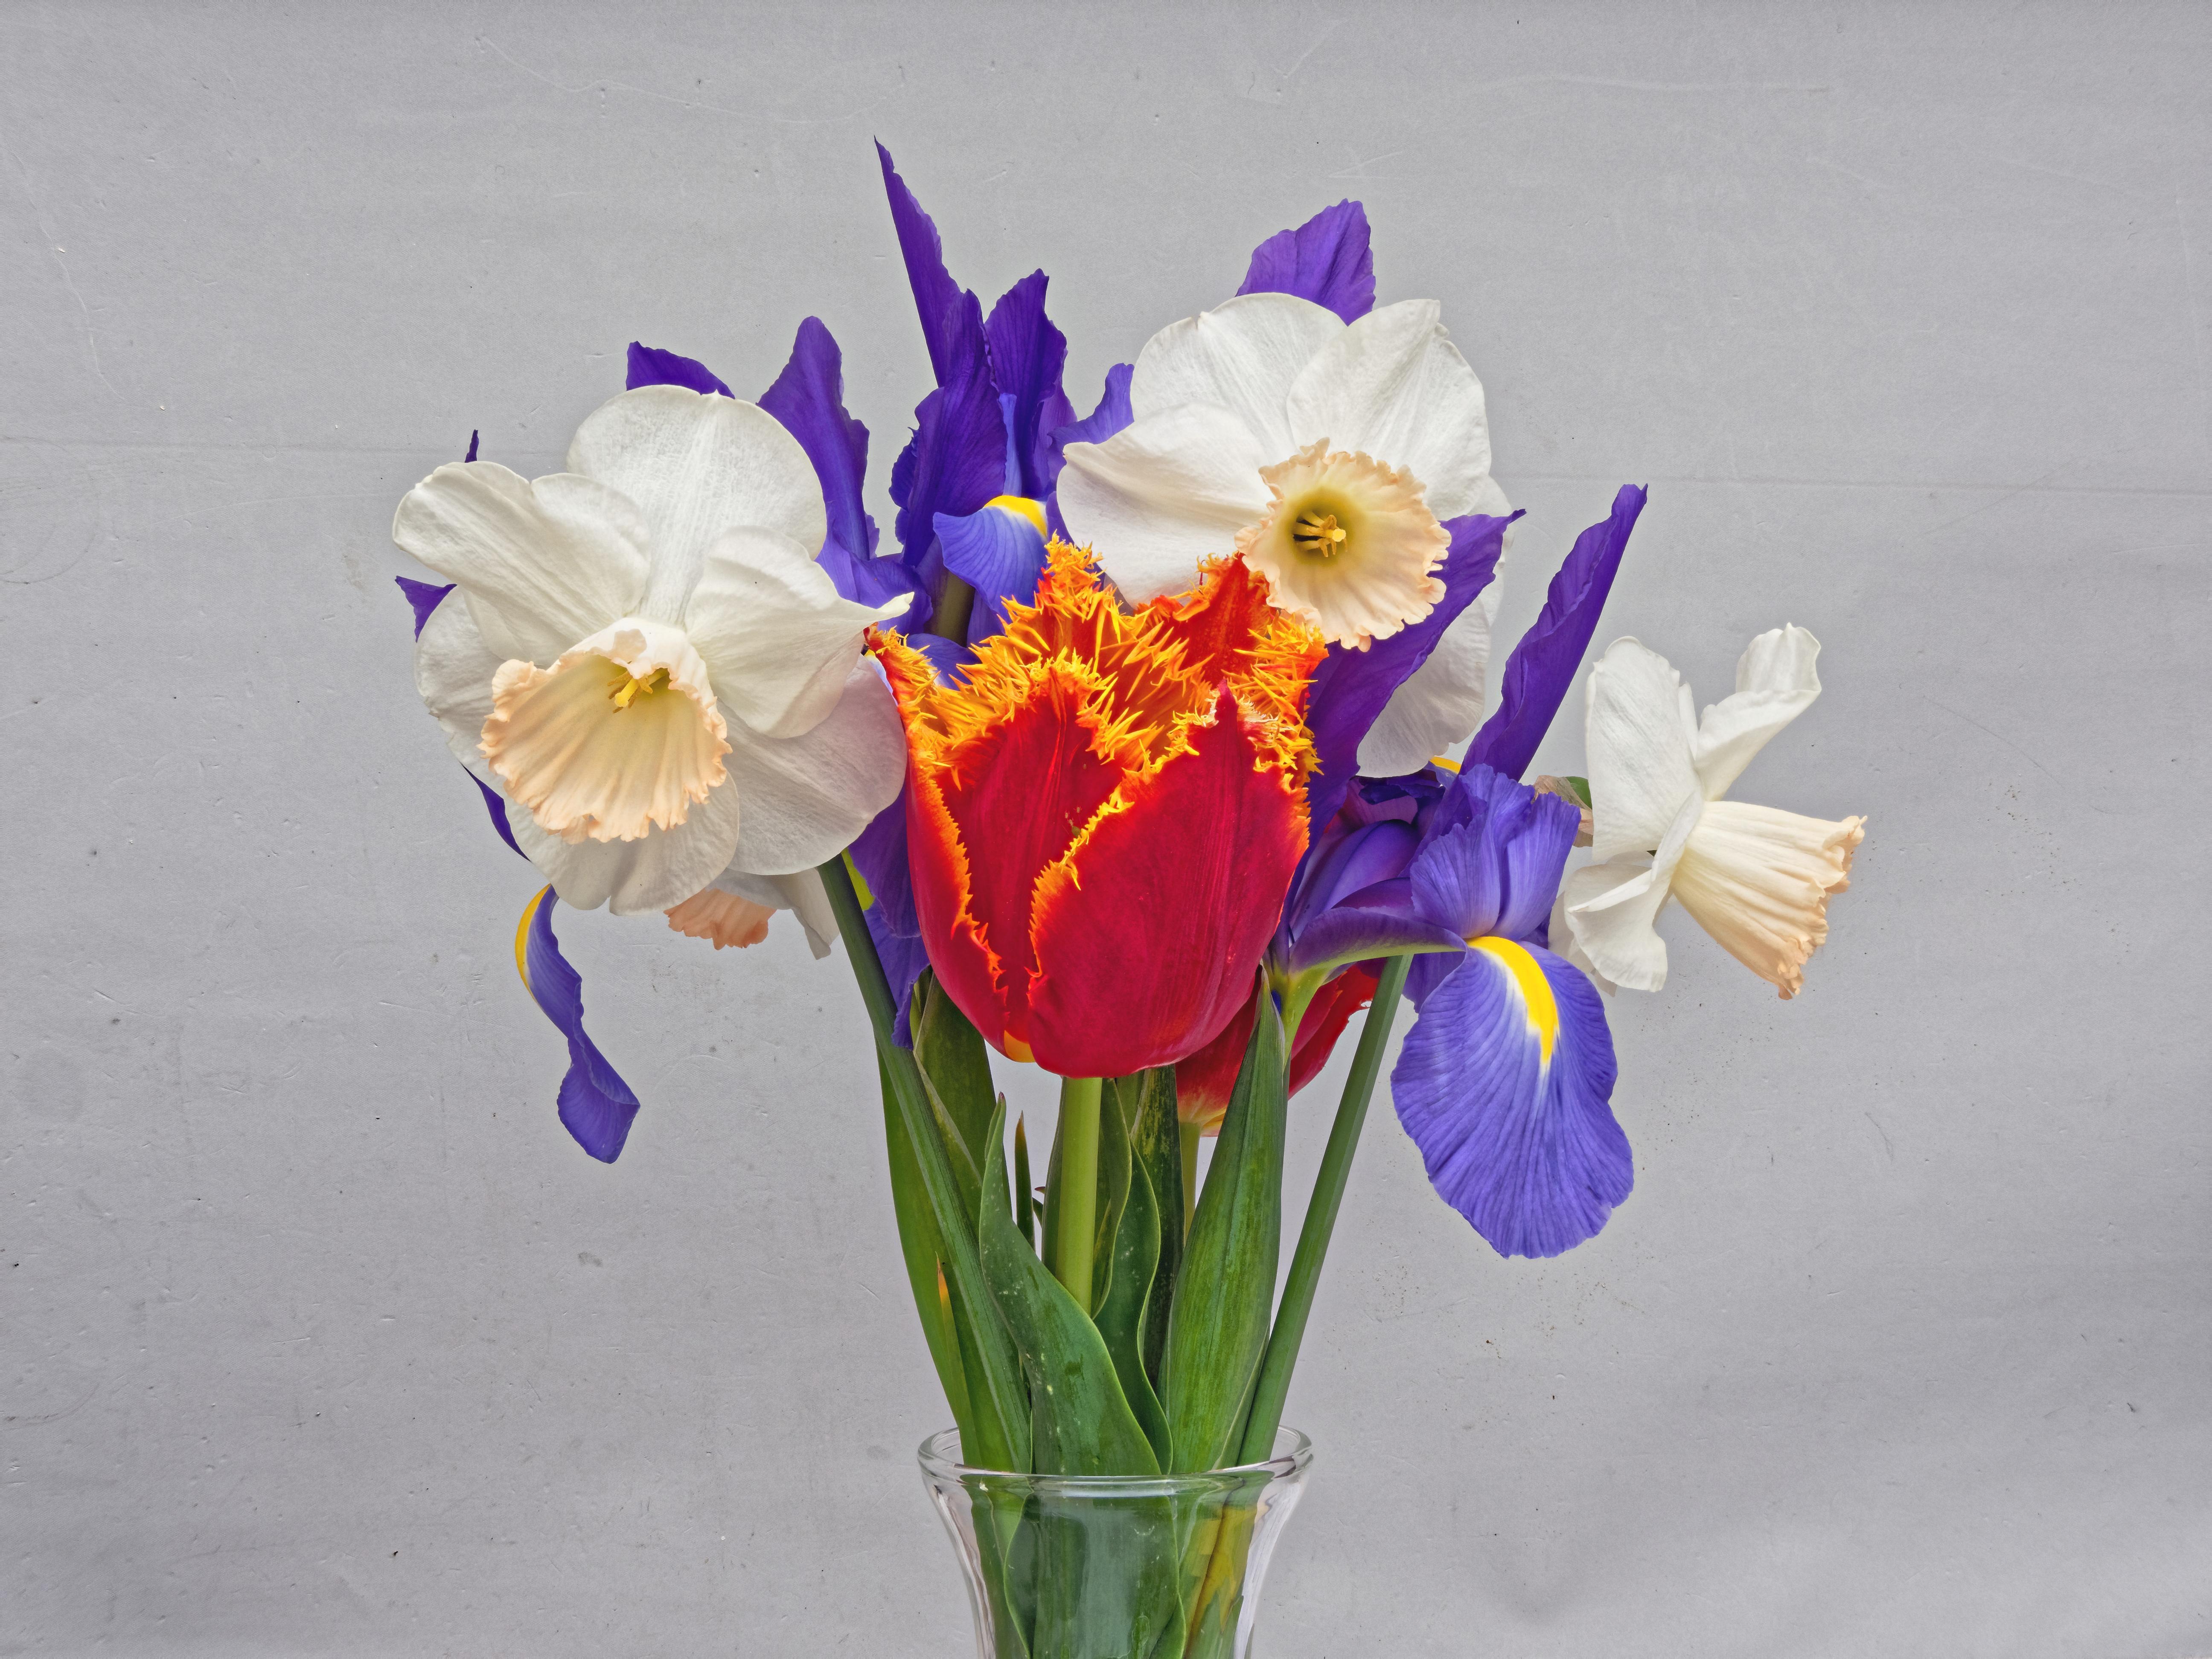 Flowers-4-PMax.jpeg